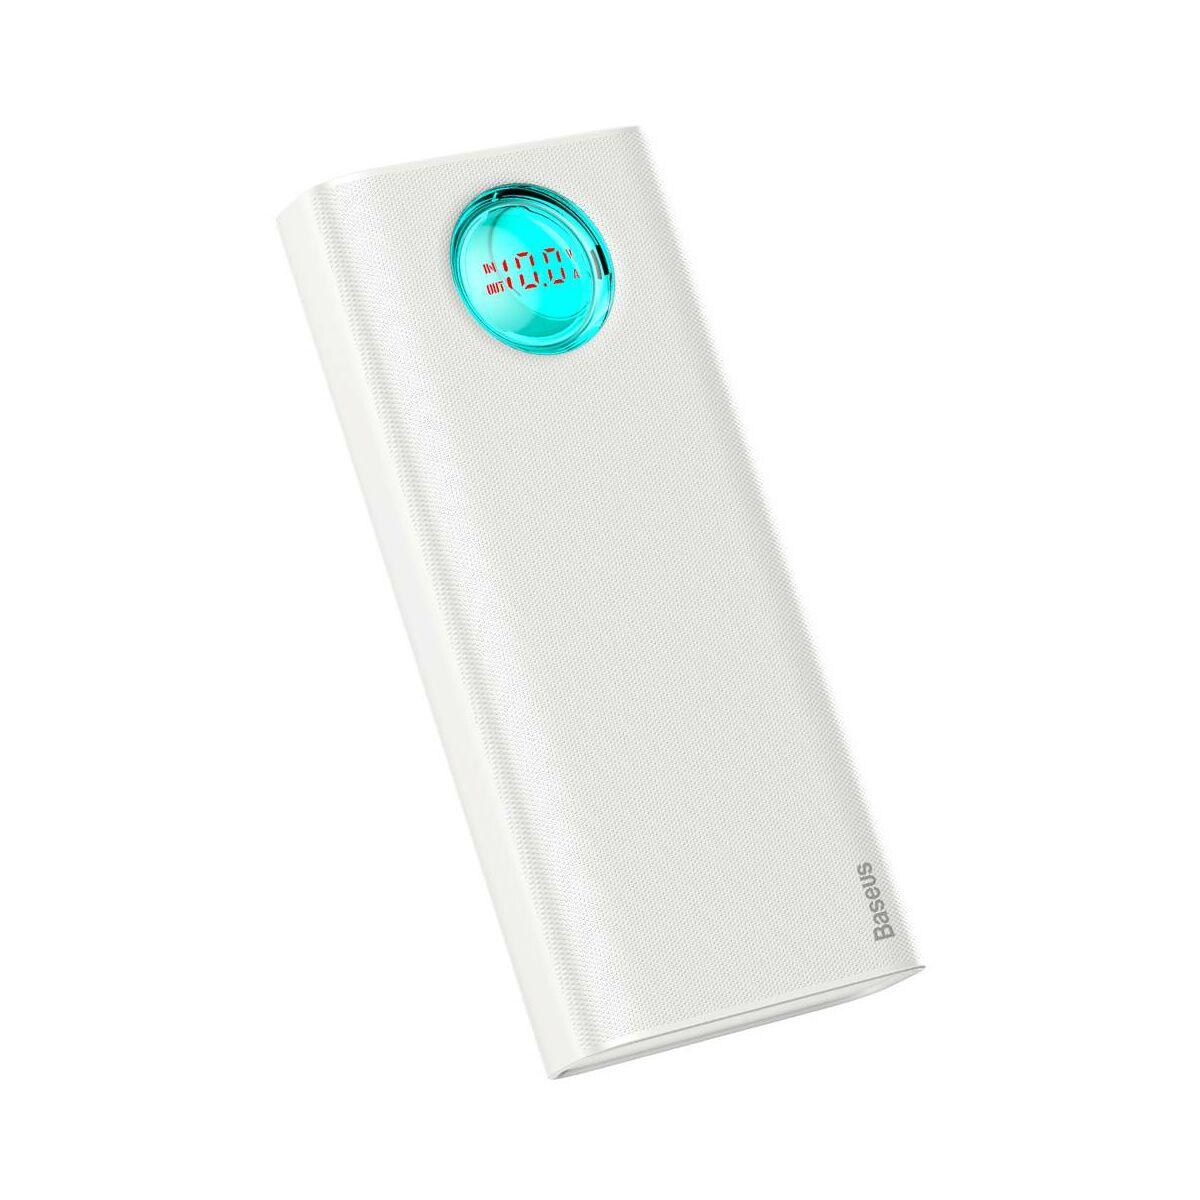 Baseus Power Bank Amblight kijelzővel (PD3.0, QC3.0) 18W 20000 mAh, fehér (PPALL-LG02)